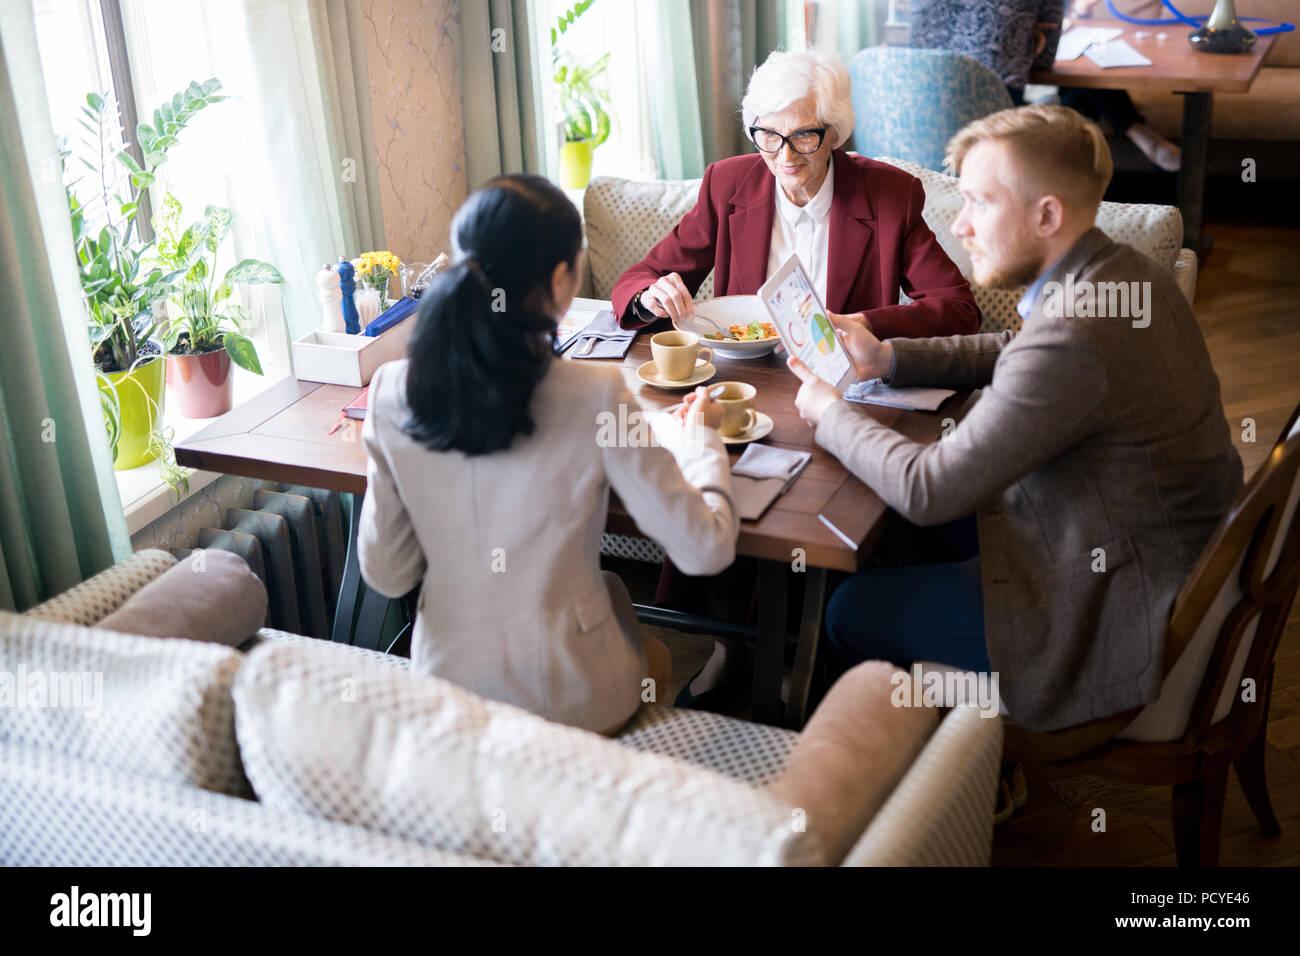 Informal meeting at the restaurant - Stock Image